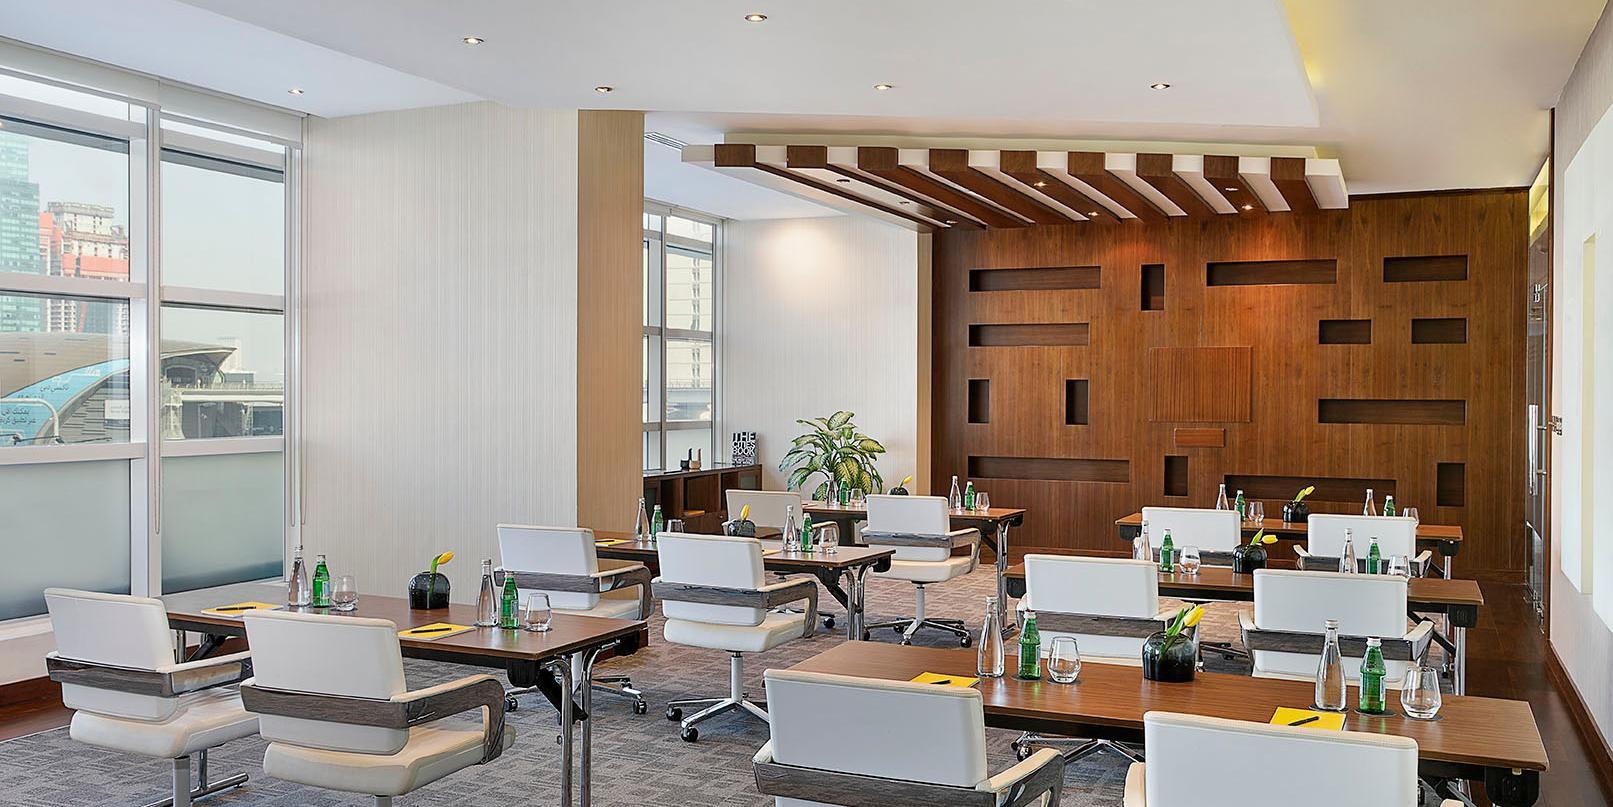 Nassima Meeting Room, voco Dubai, Sheikh Zayed Road view